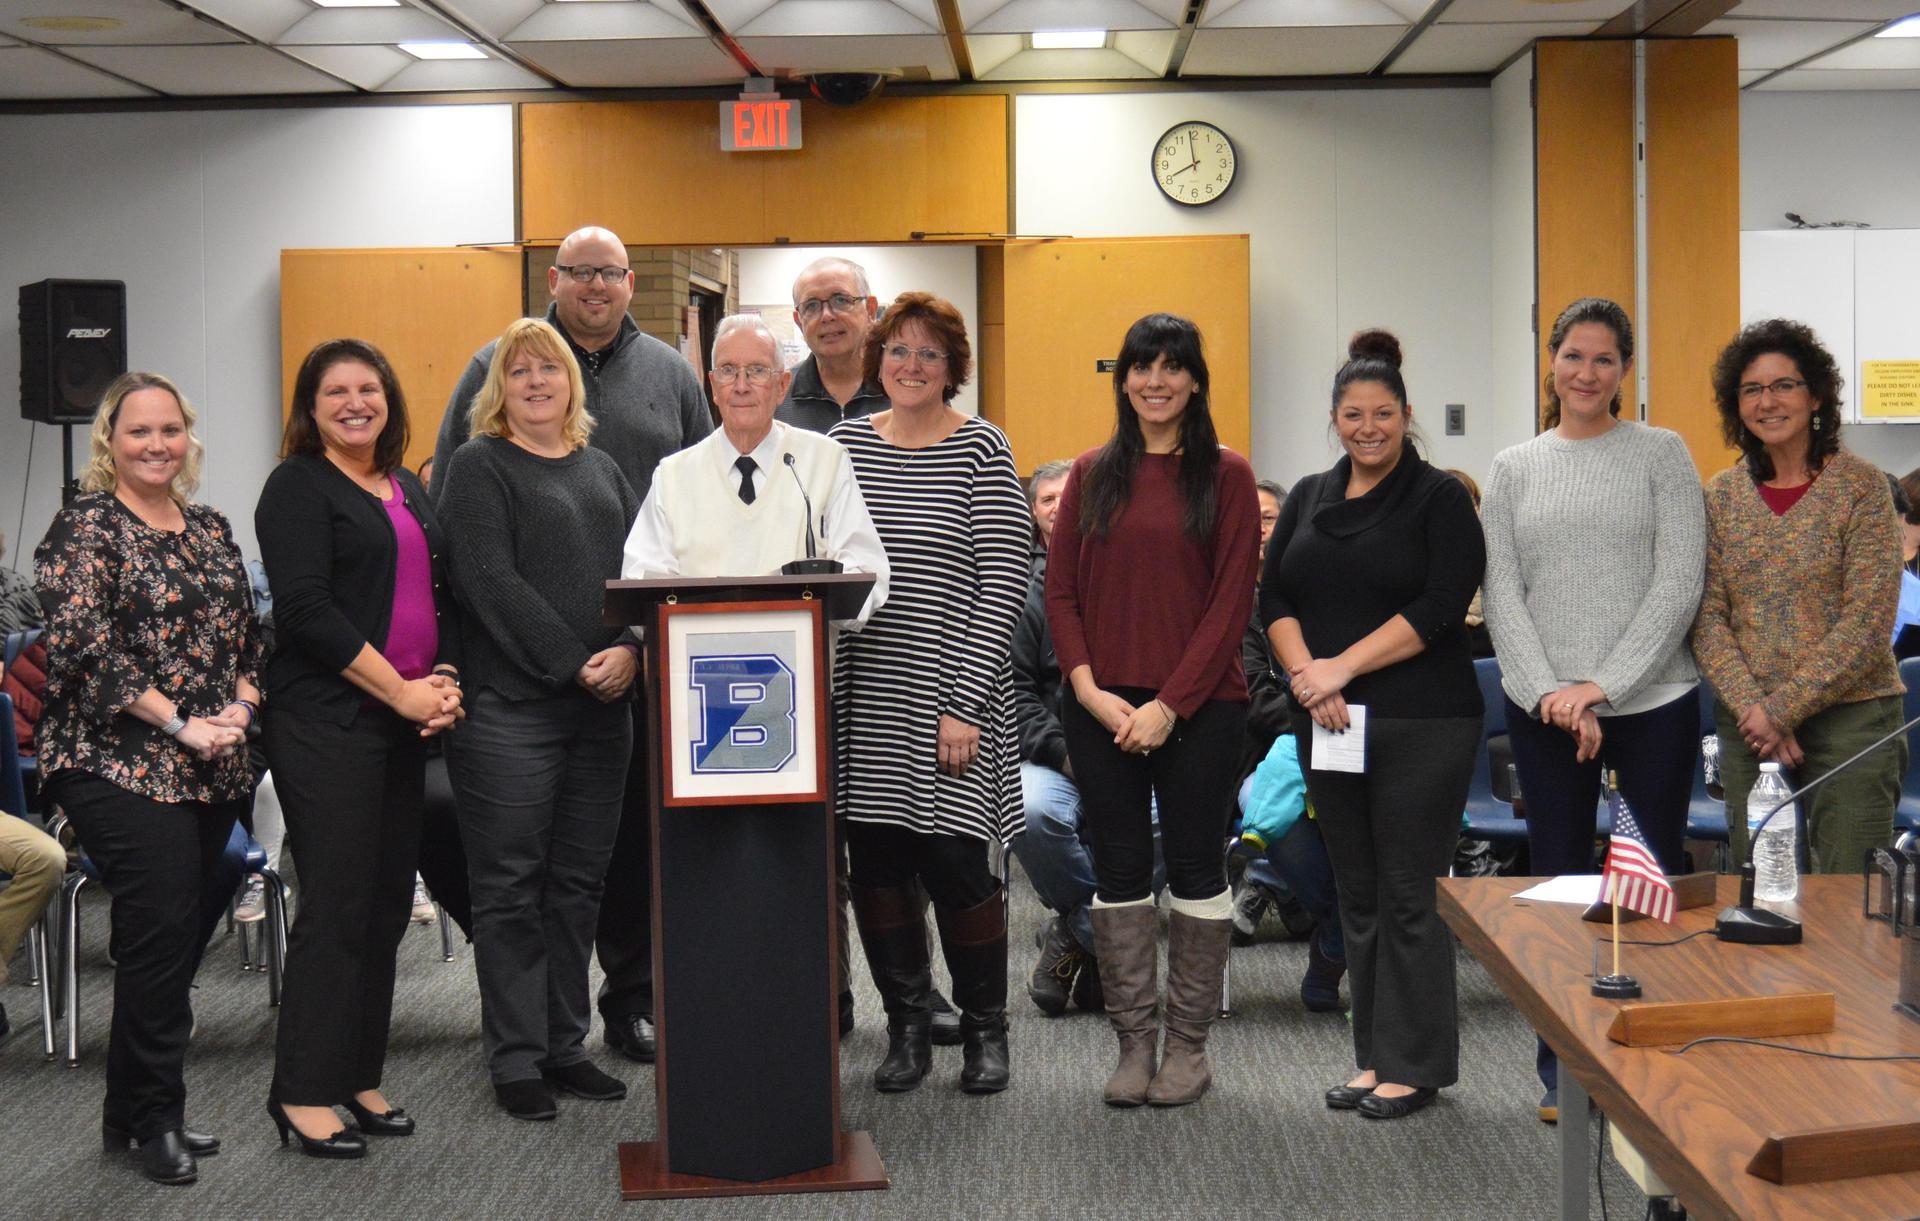 8 female teachers standing around the podium with JFTK president, Mr. Ralph Douglass and treasurer, Mr. Jim Gilbert